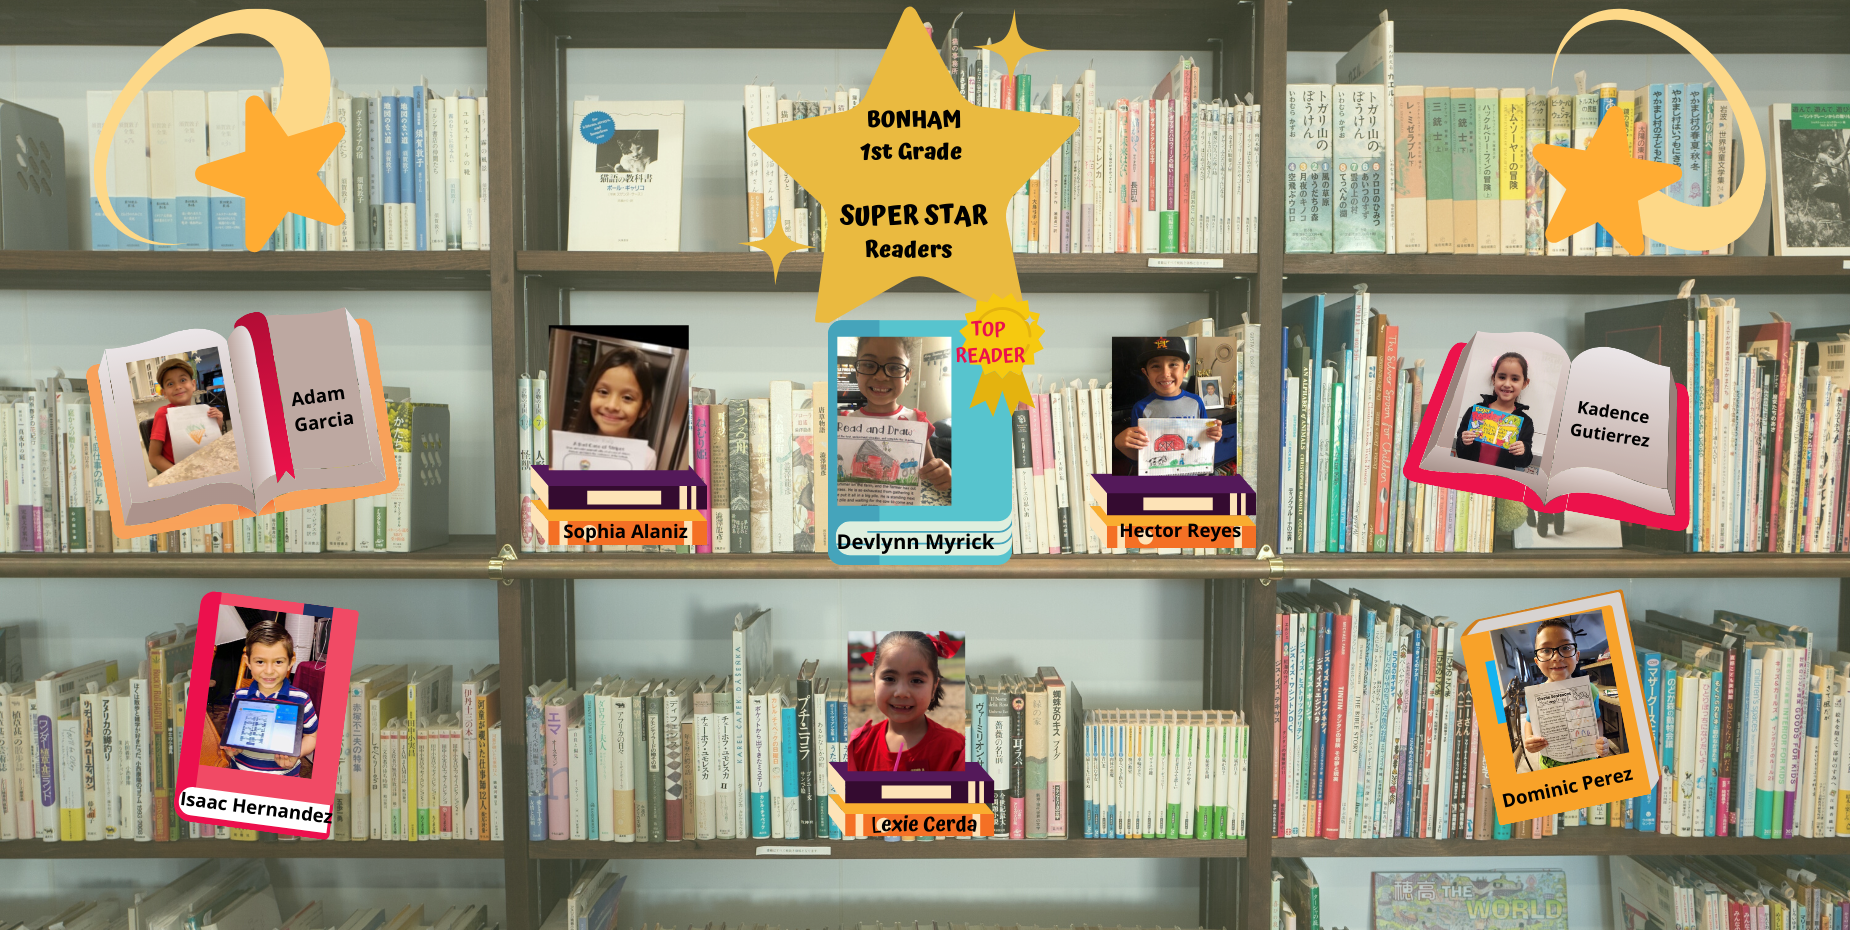 1st Grade Super Readers